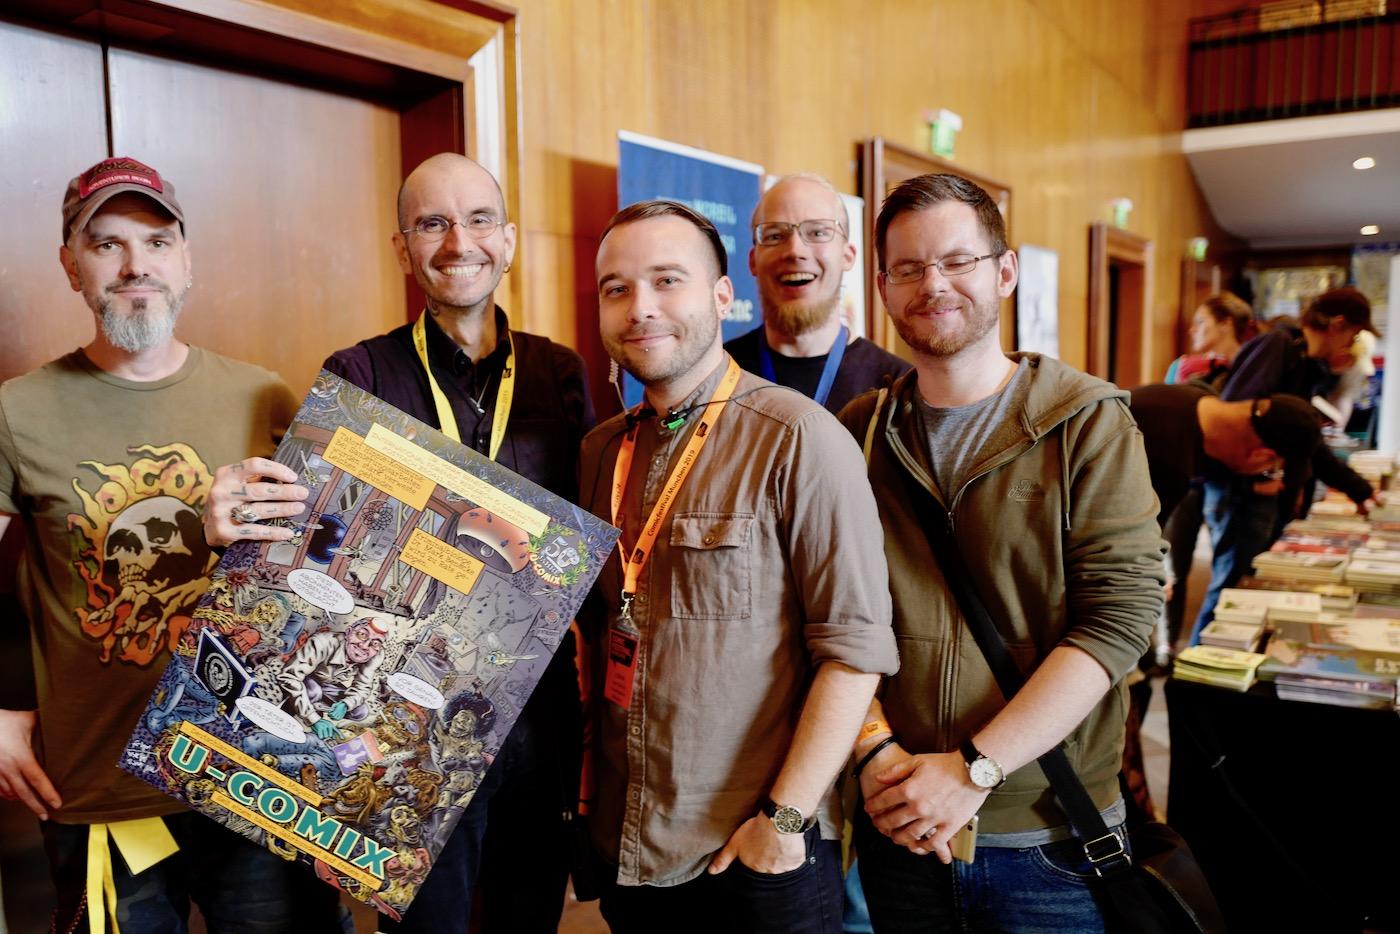 mark_benecke_comic_festival_muenchen_munich_comic_con_2019 - 19.jpg